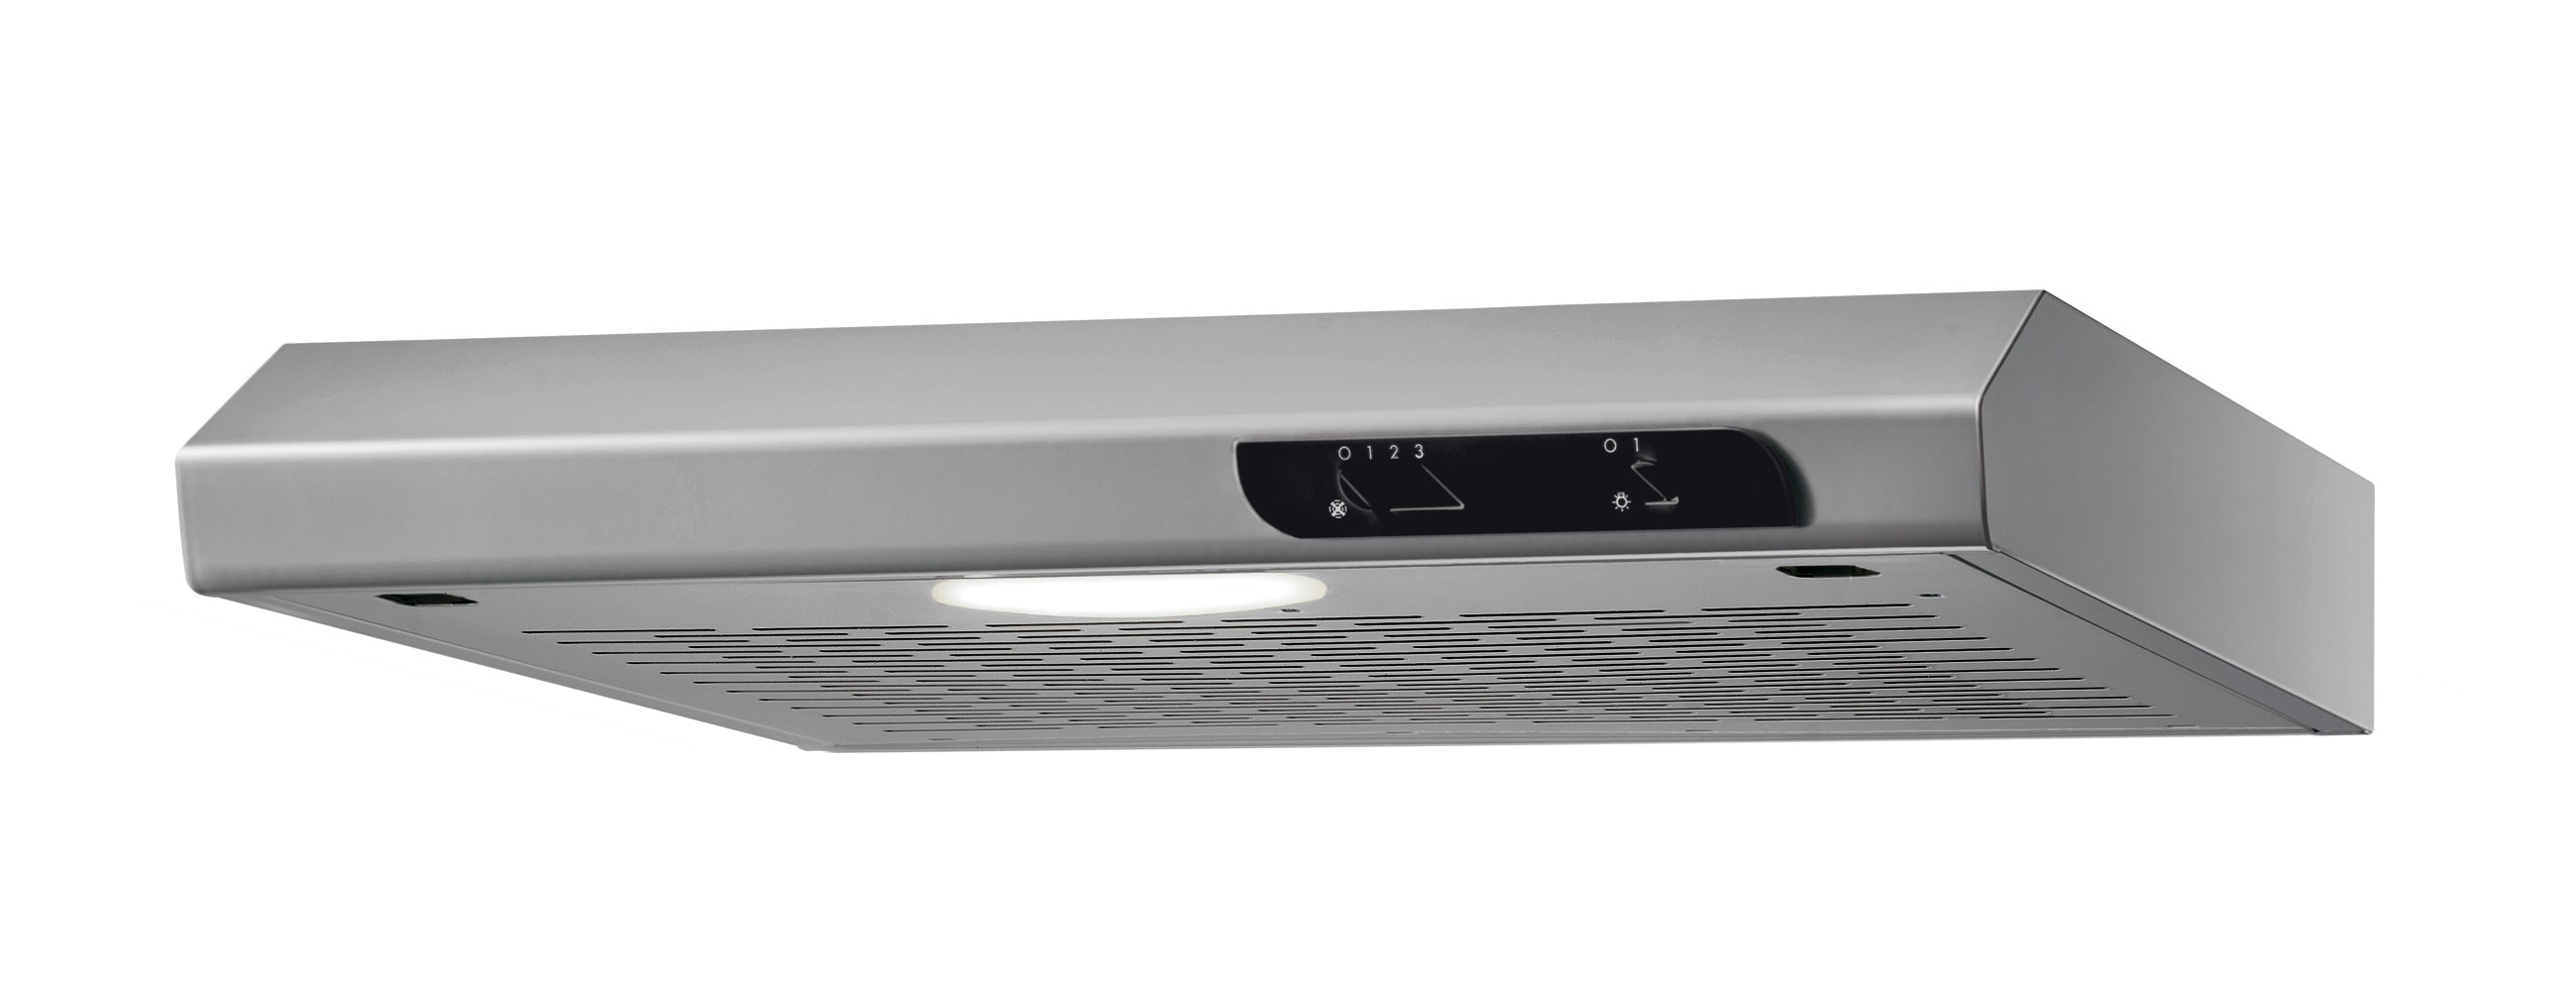 Dunstabzugshaube / Unterbauhaube Respekta DH 540 IXL 50cm silber Bild 1